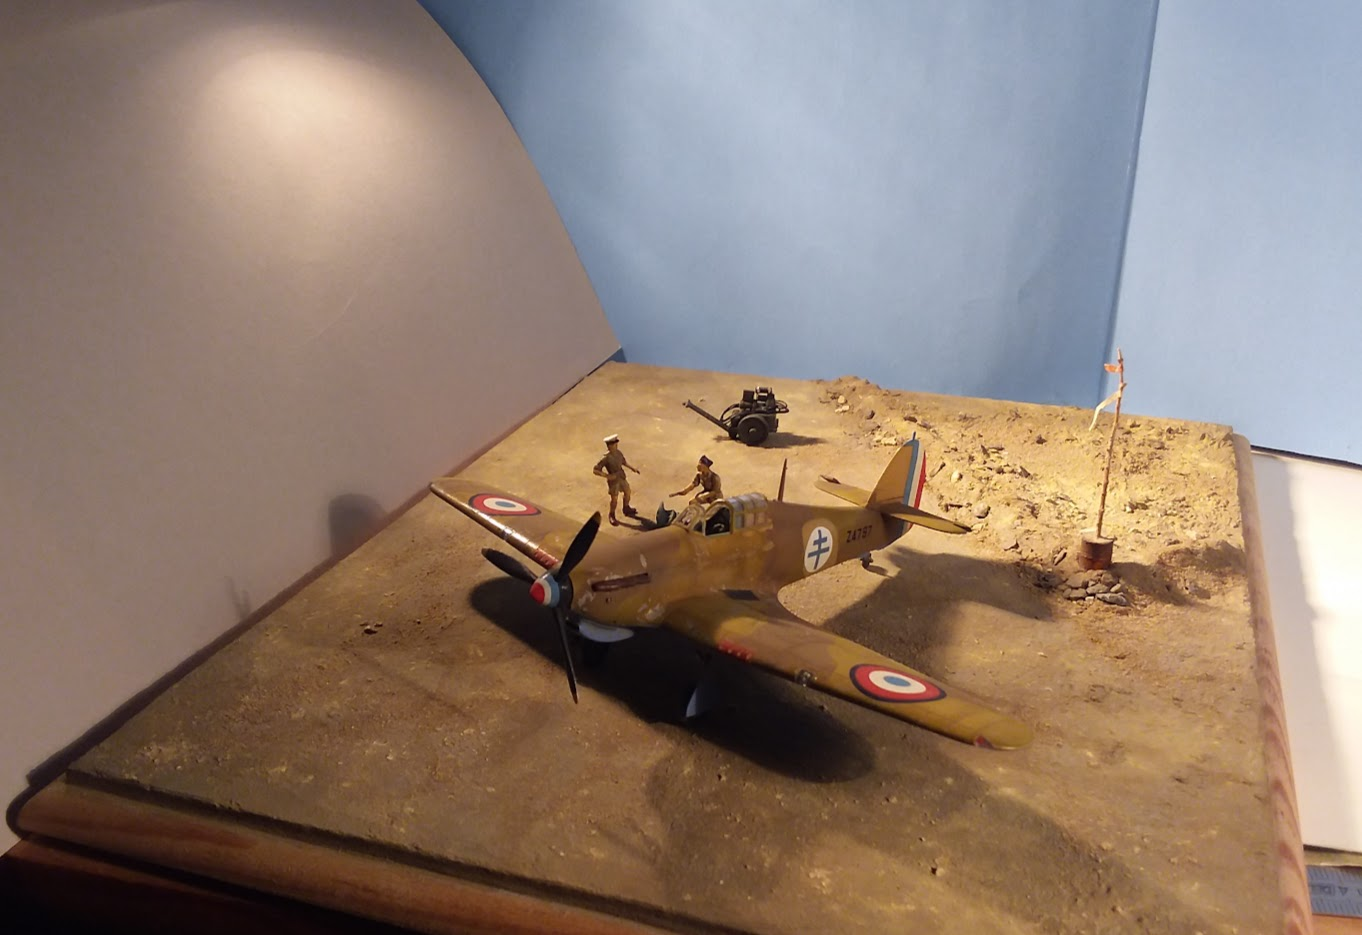 [Armahobby] Hawker Hurricane MkI ACtC-3eg4PB8_fLsnWAlJoDDwJOz4cwFoyg1g3zkWX4MBJuAx5to0QDCT8-LXHx99Y75DjDJKiJyuFPulTNFdKTaUCU41uq2KctWoP-E900ENvmpxGxAfqItqf2smk5sR5mLG1hGbPAHDQUUfWg7rENuE0MFWg=w1363-h936-no?authuser=0